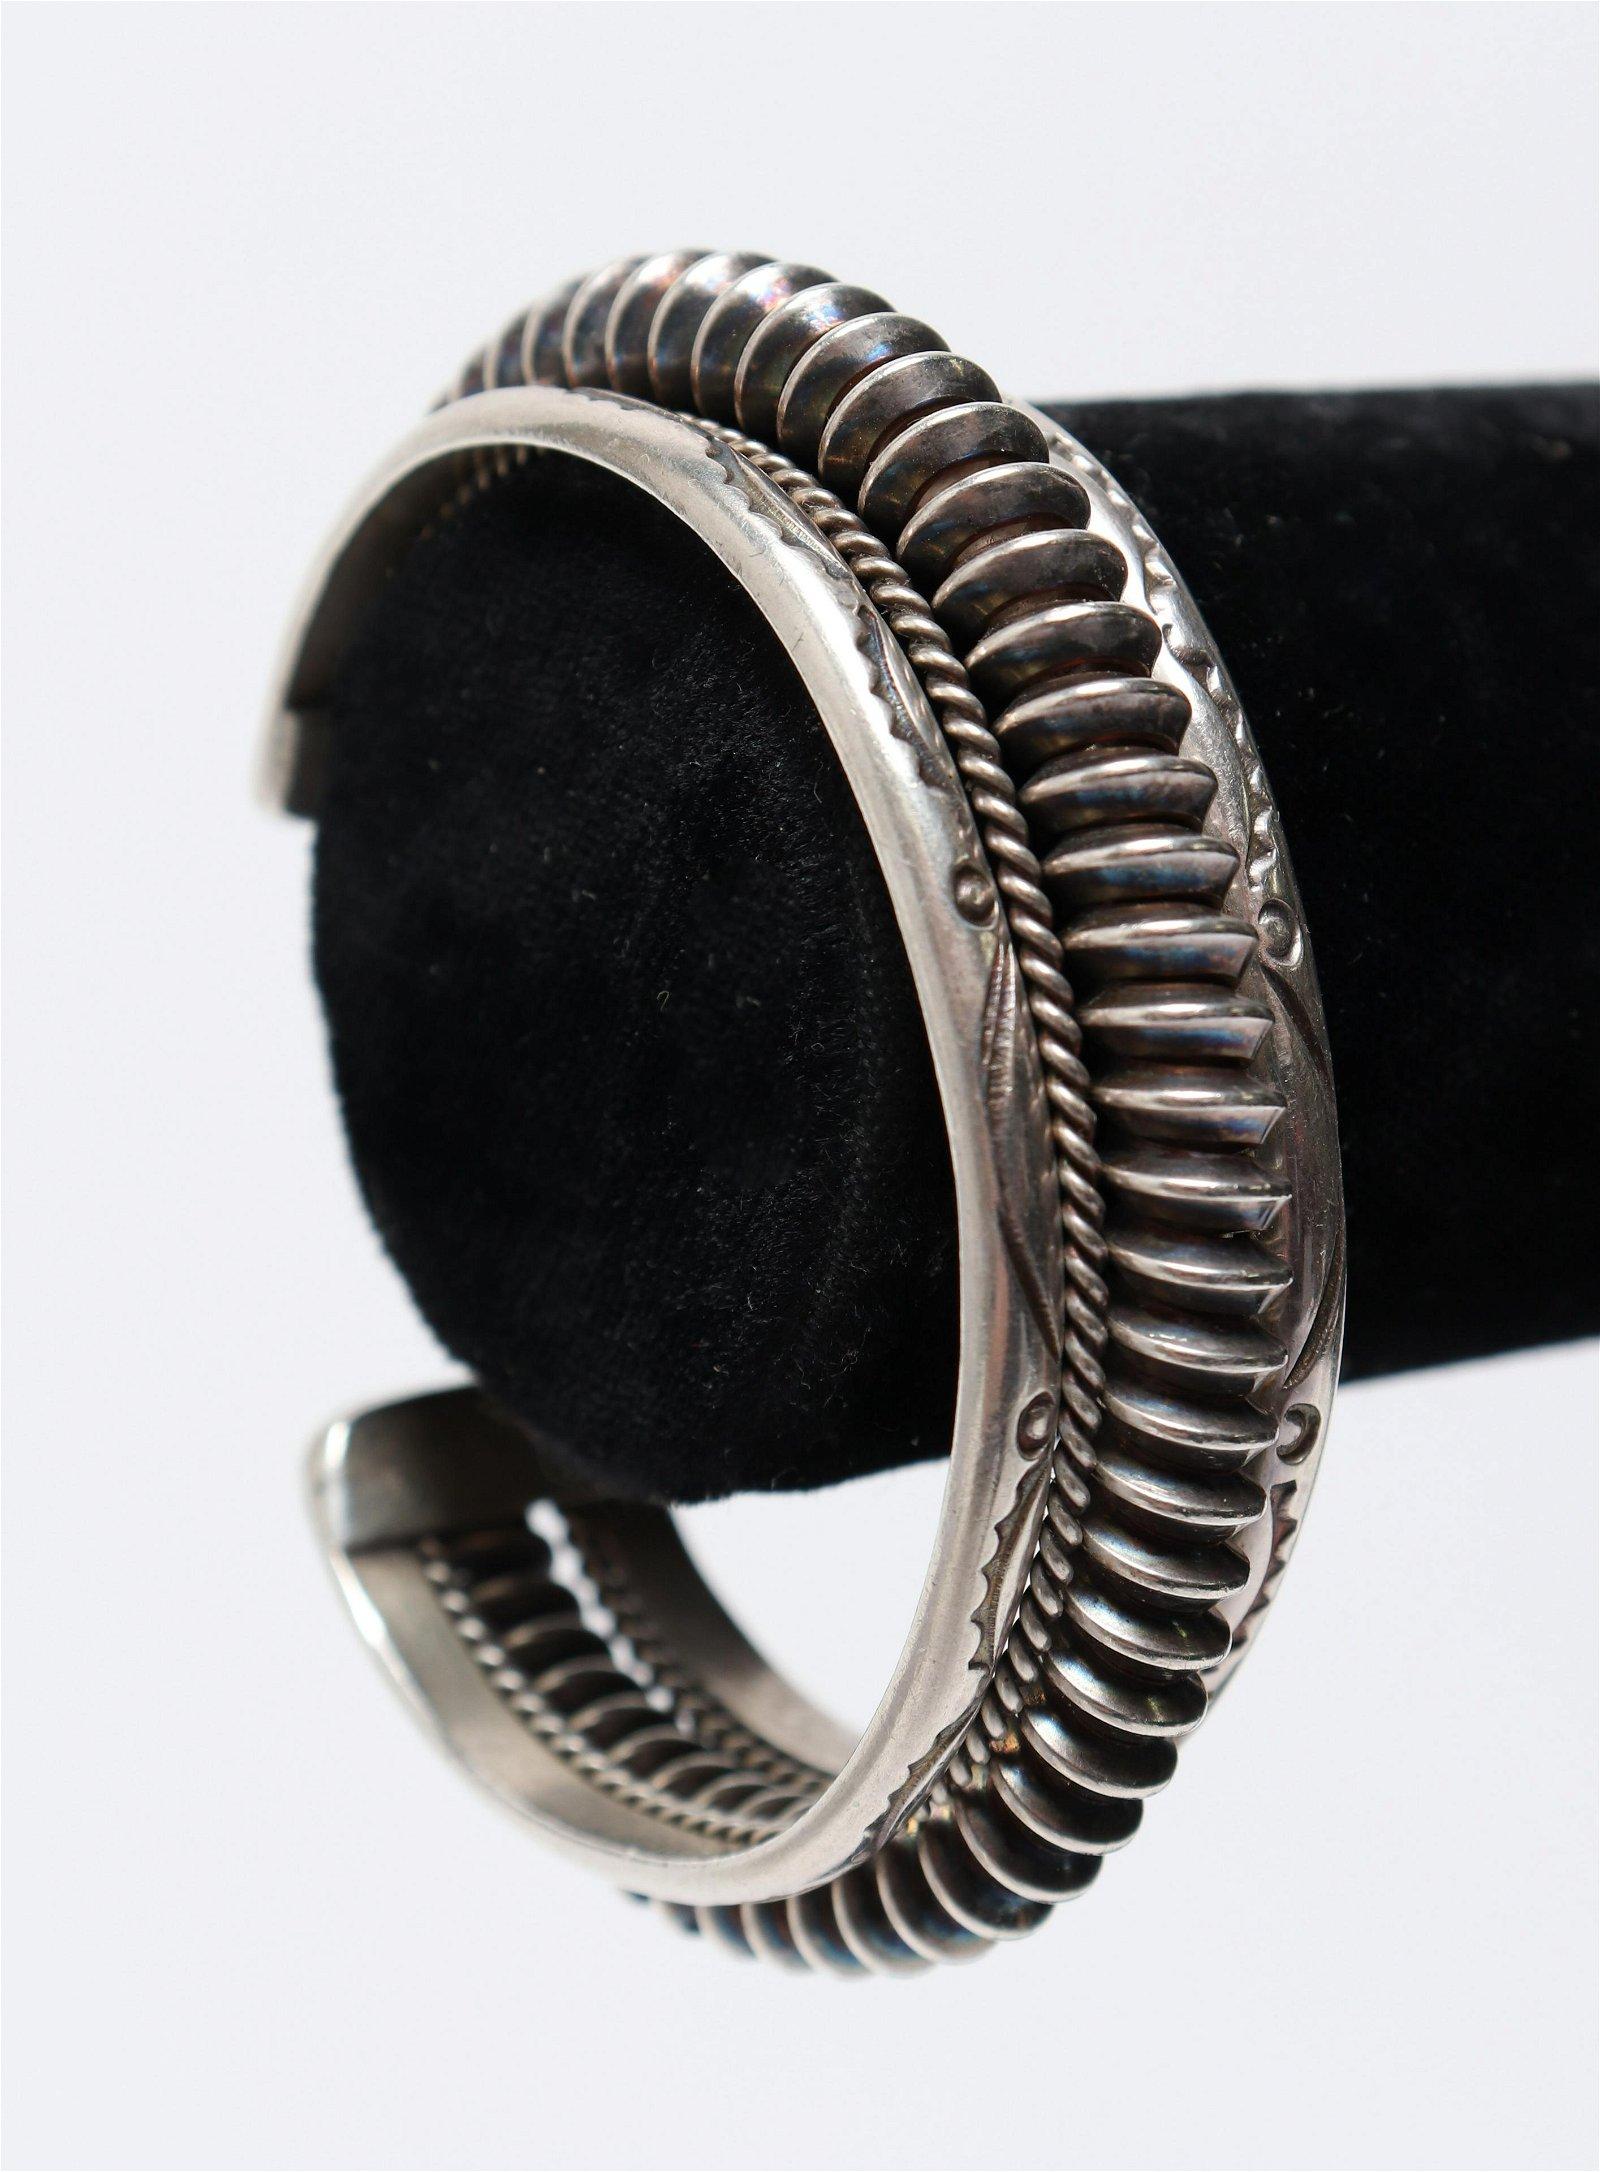 Navajo Native American Silver Cuff Bracelet